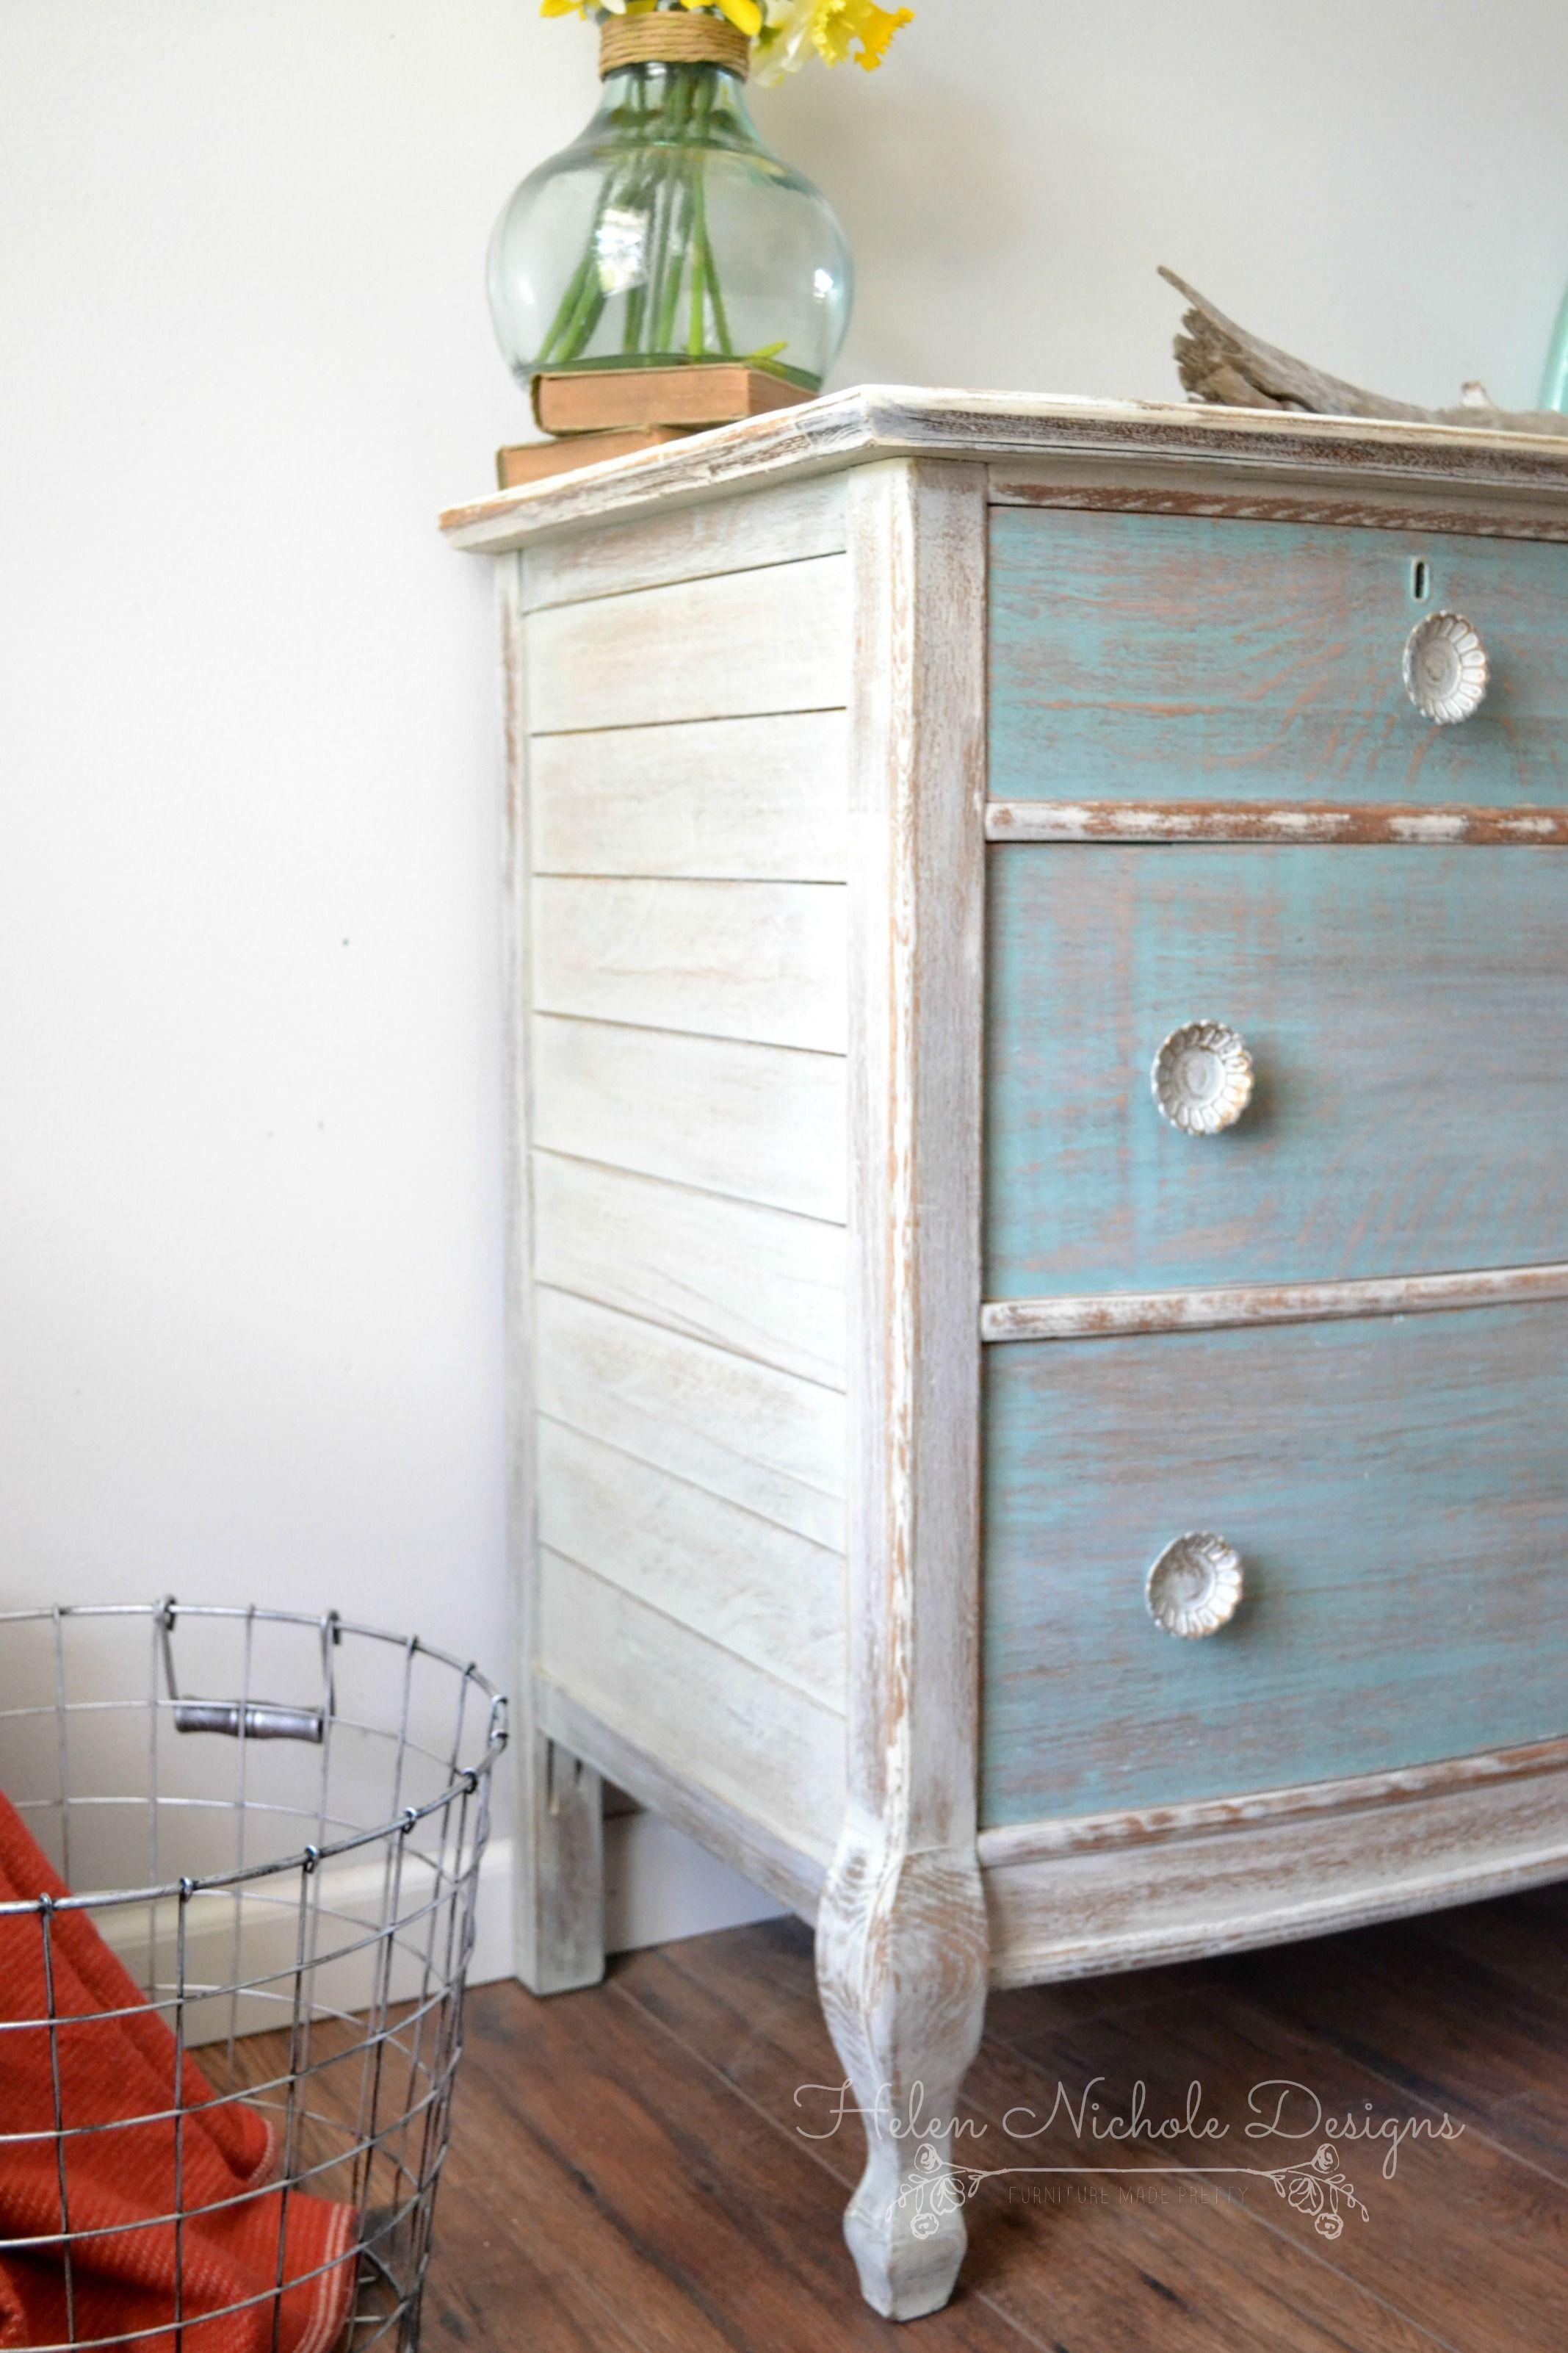 Beachy Wood Plank Dresser, Helen Nichole Designs, Milk Paint, White Washed  Furniture,